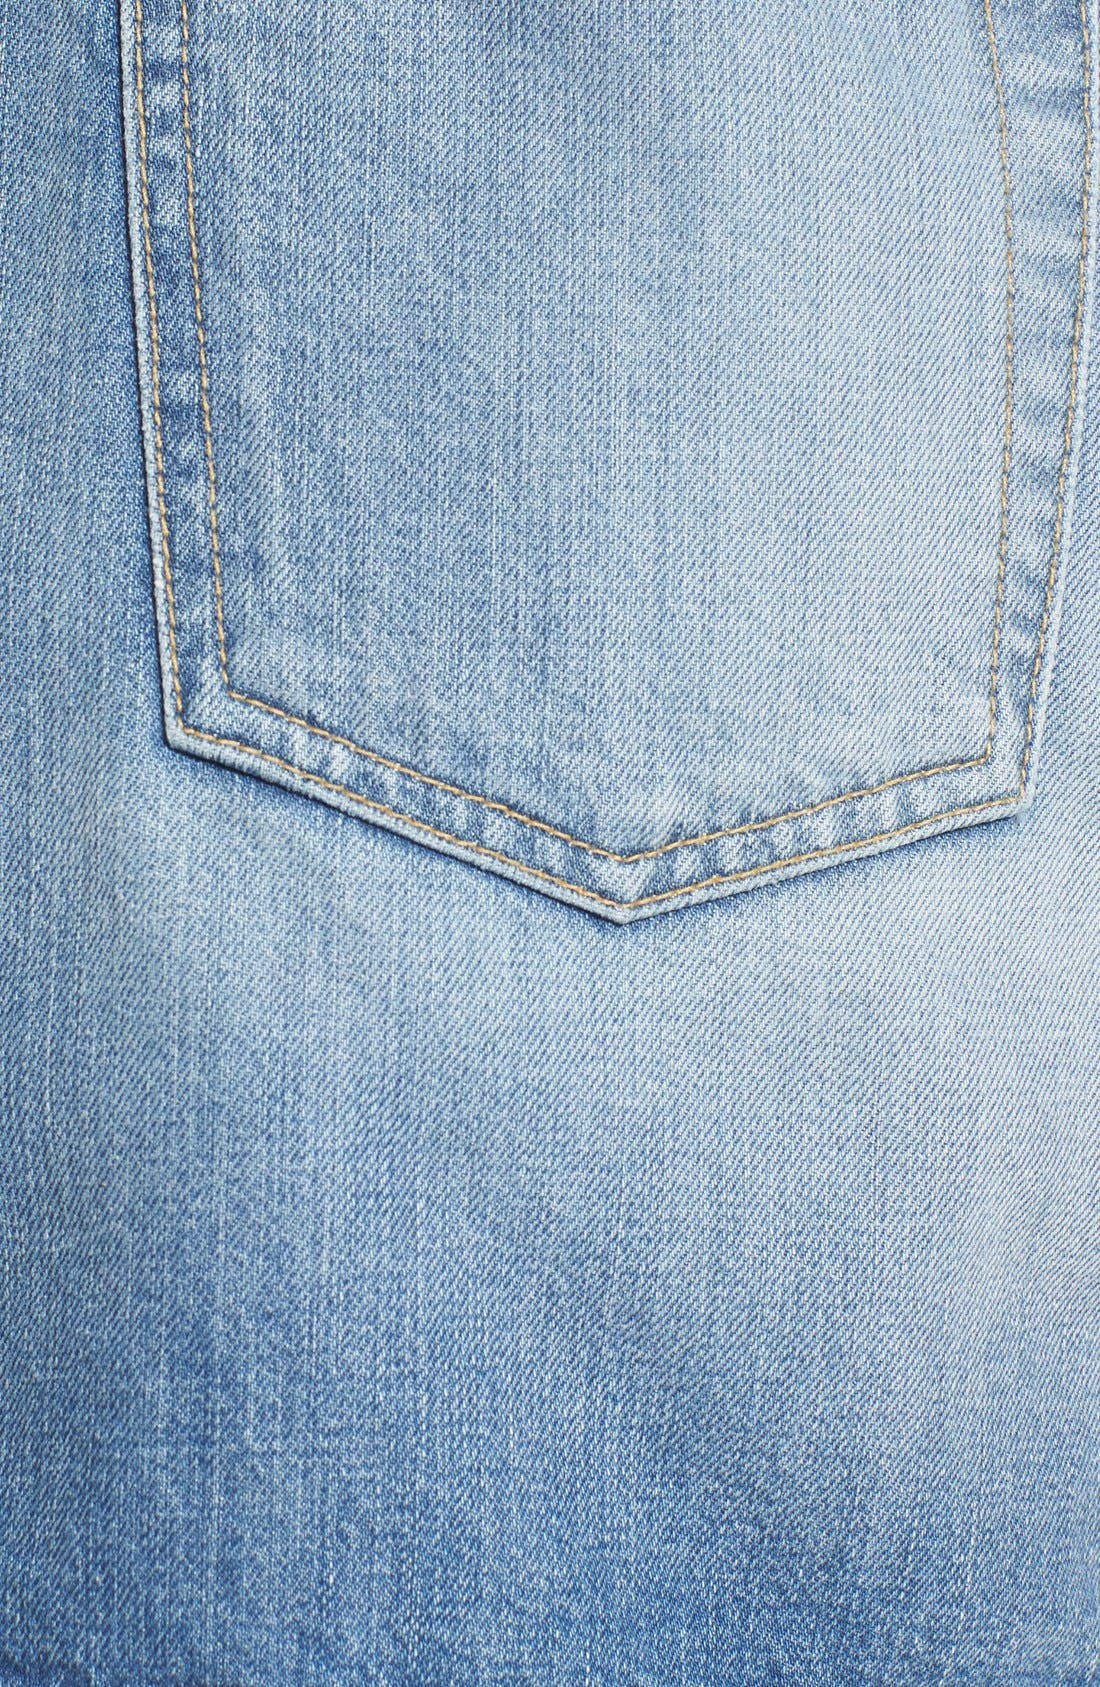 Alternate Image 5  - 7 For All Mankind® Utility Pocket Denim Miniskirt (Vintage Coronado Springs)